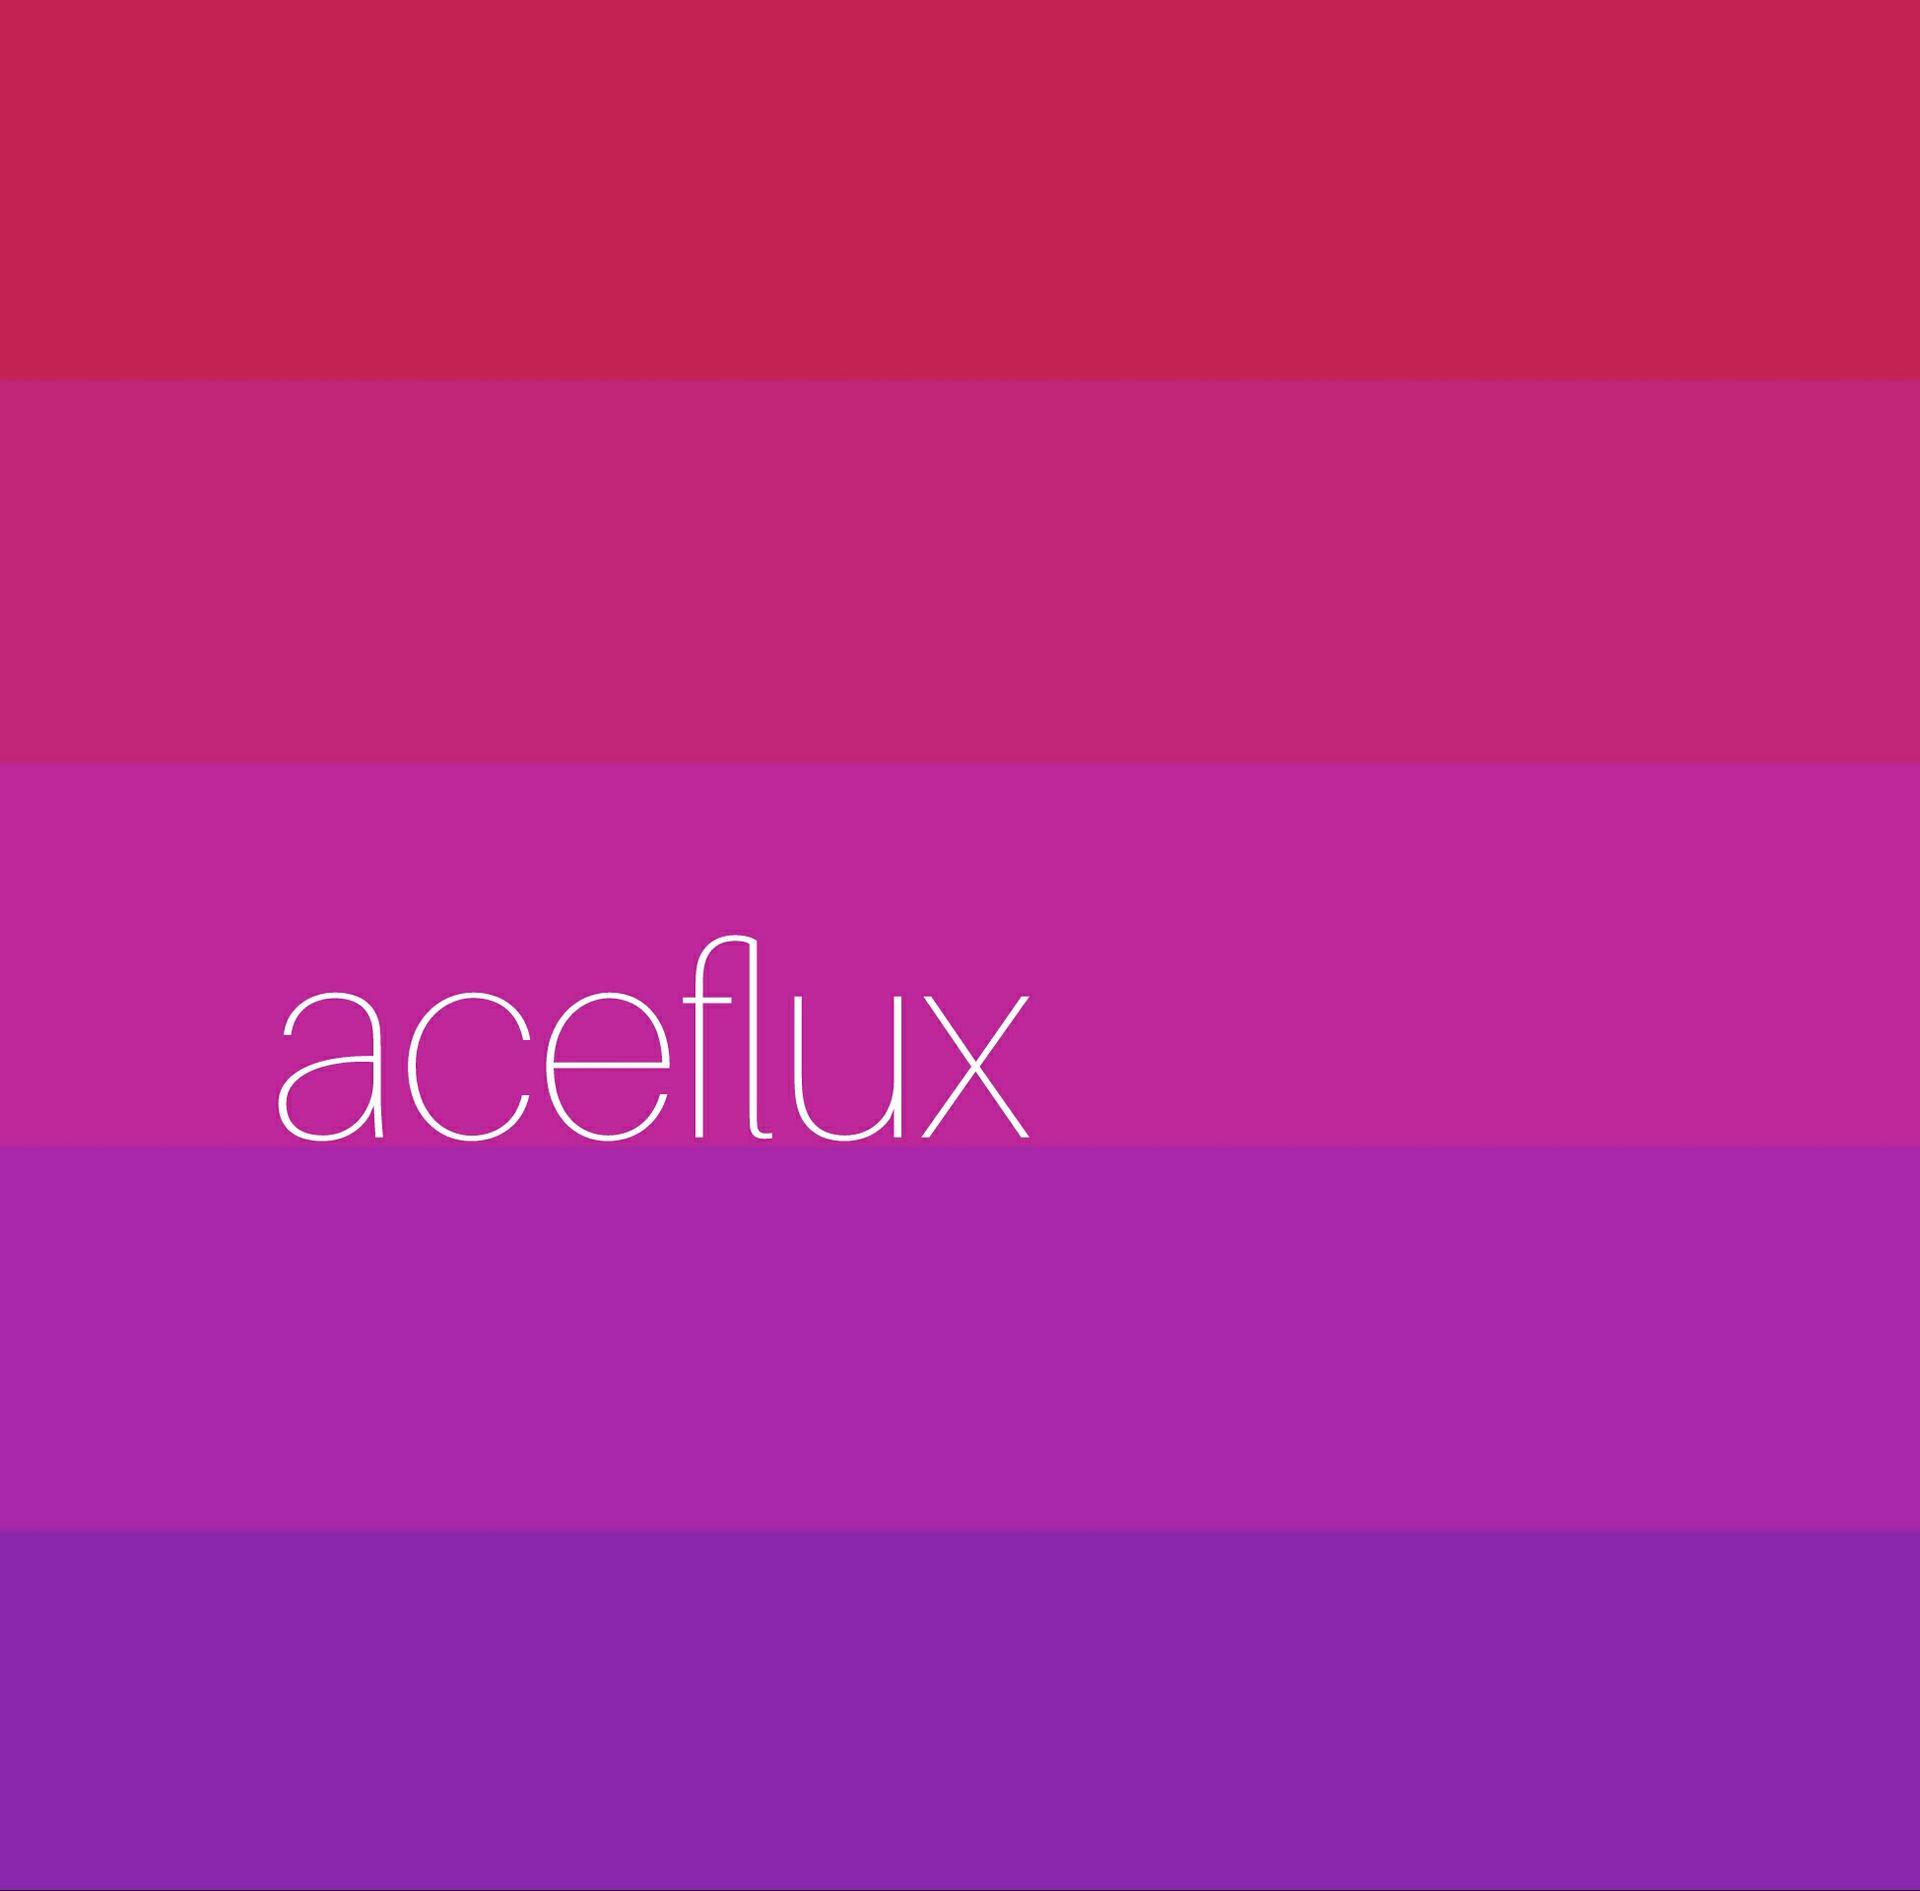 Aceflux sexuality